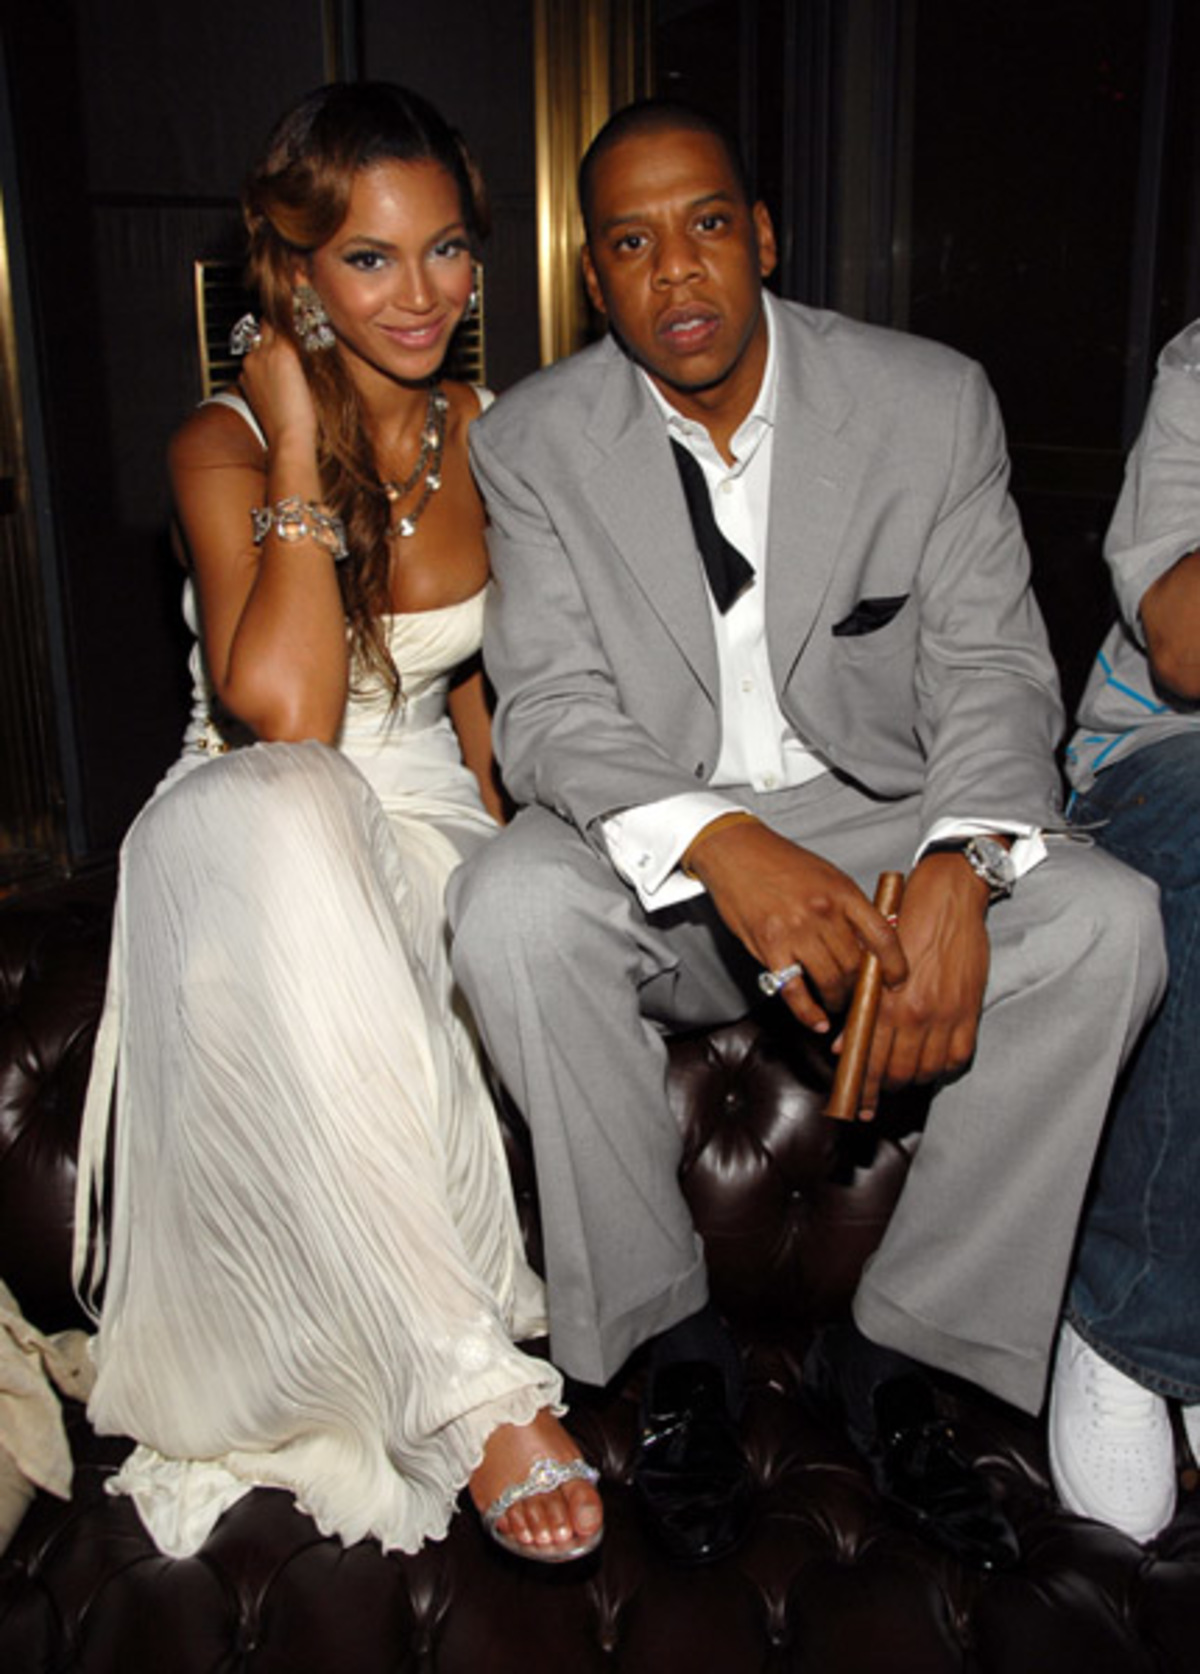 Beyonce και Jay-Z ζευγάρι και στη σκηνή! | Newsit.gr